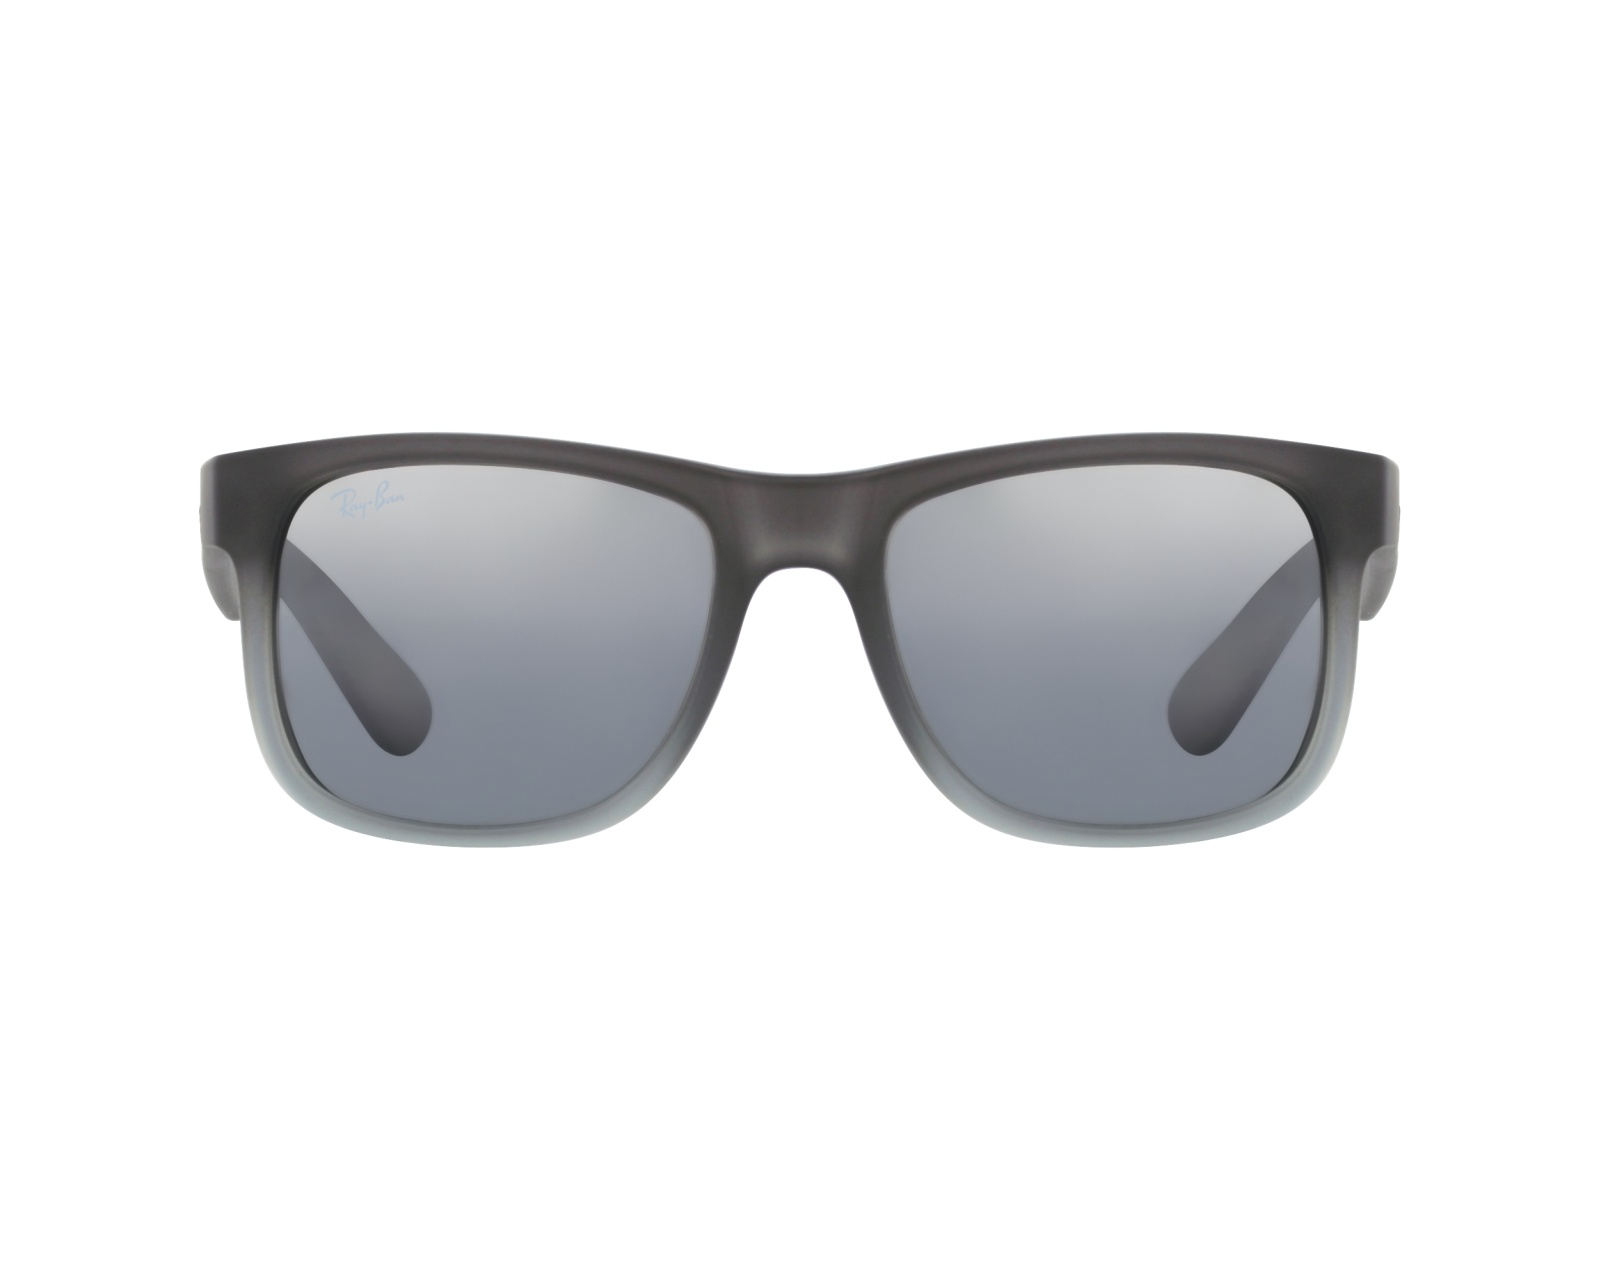 7ebaef5f5a9 Sunglasses Ray-Ban RB-4165 852 88 51-15 Grey profile view